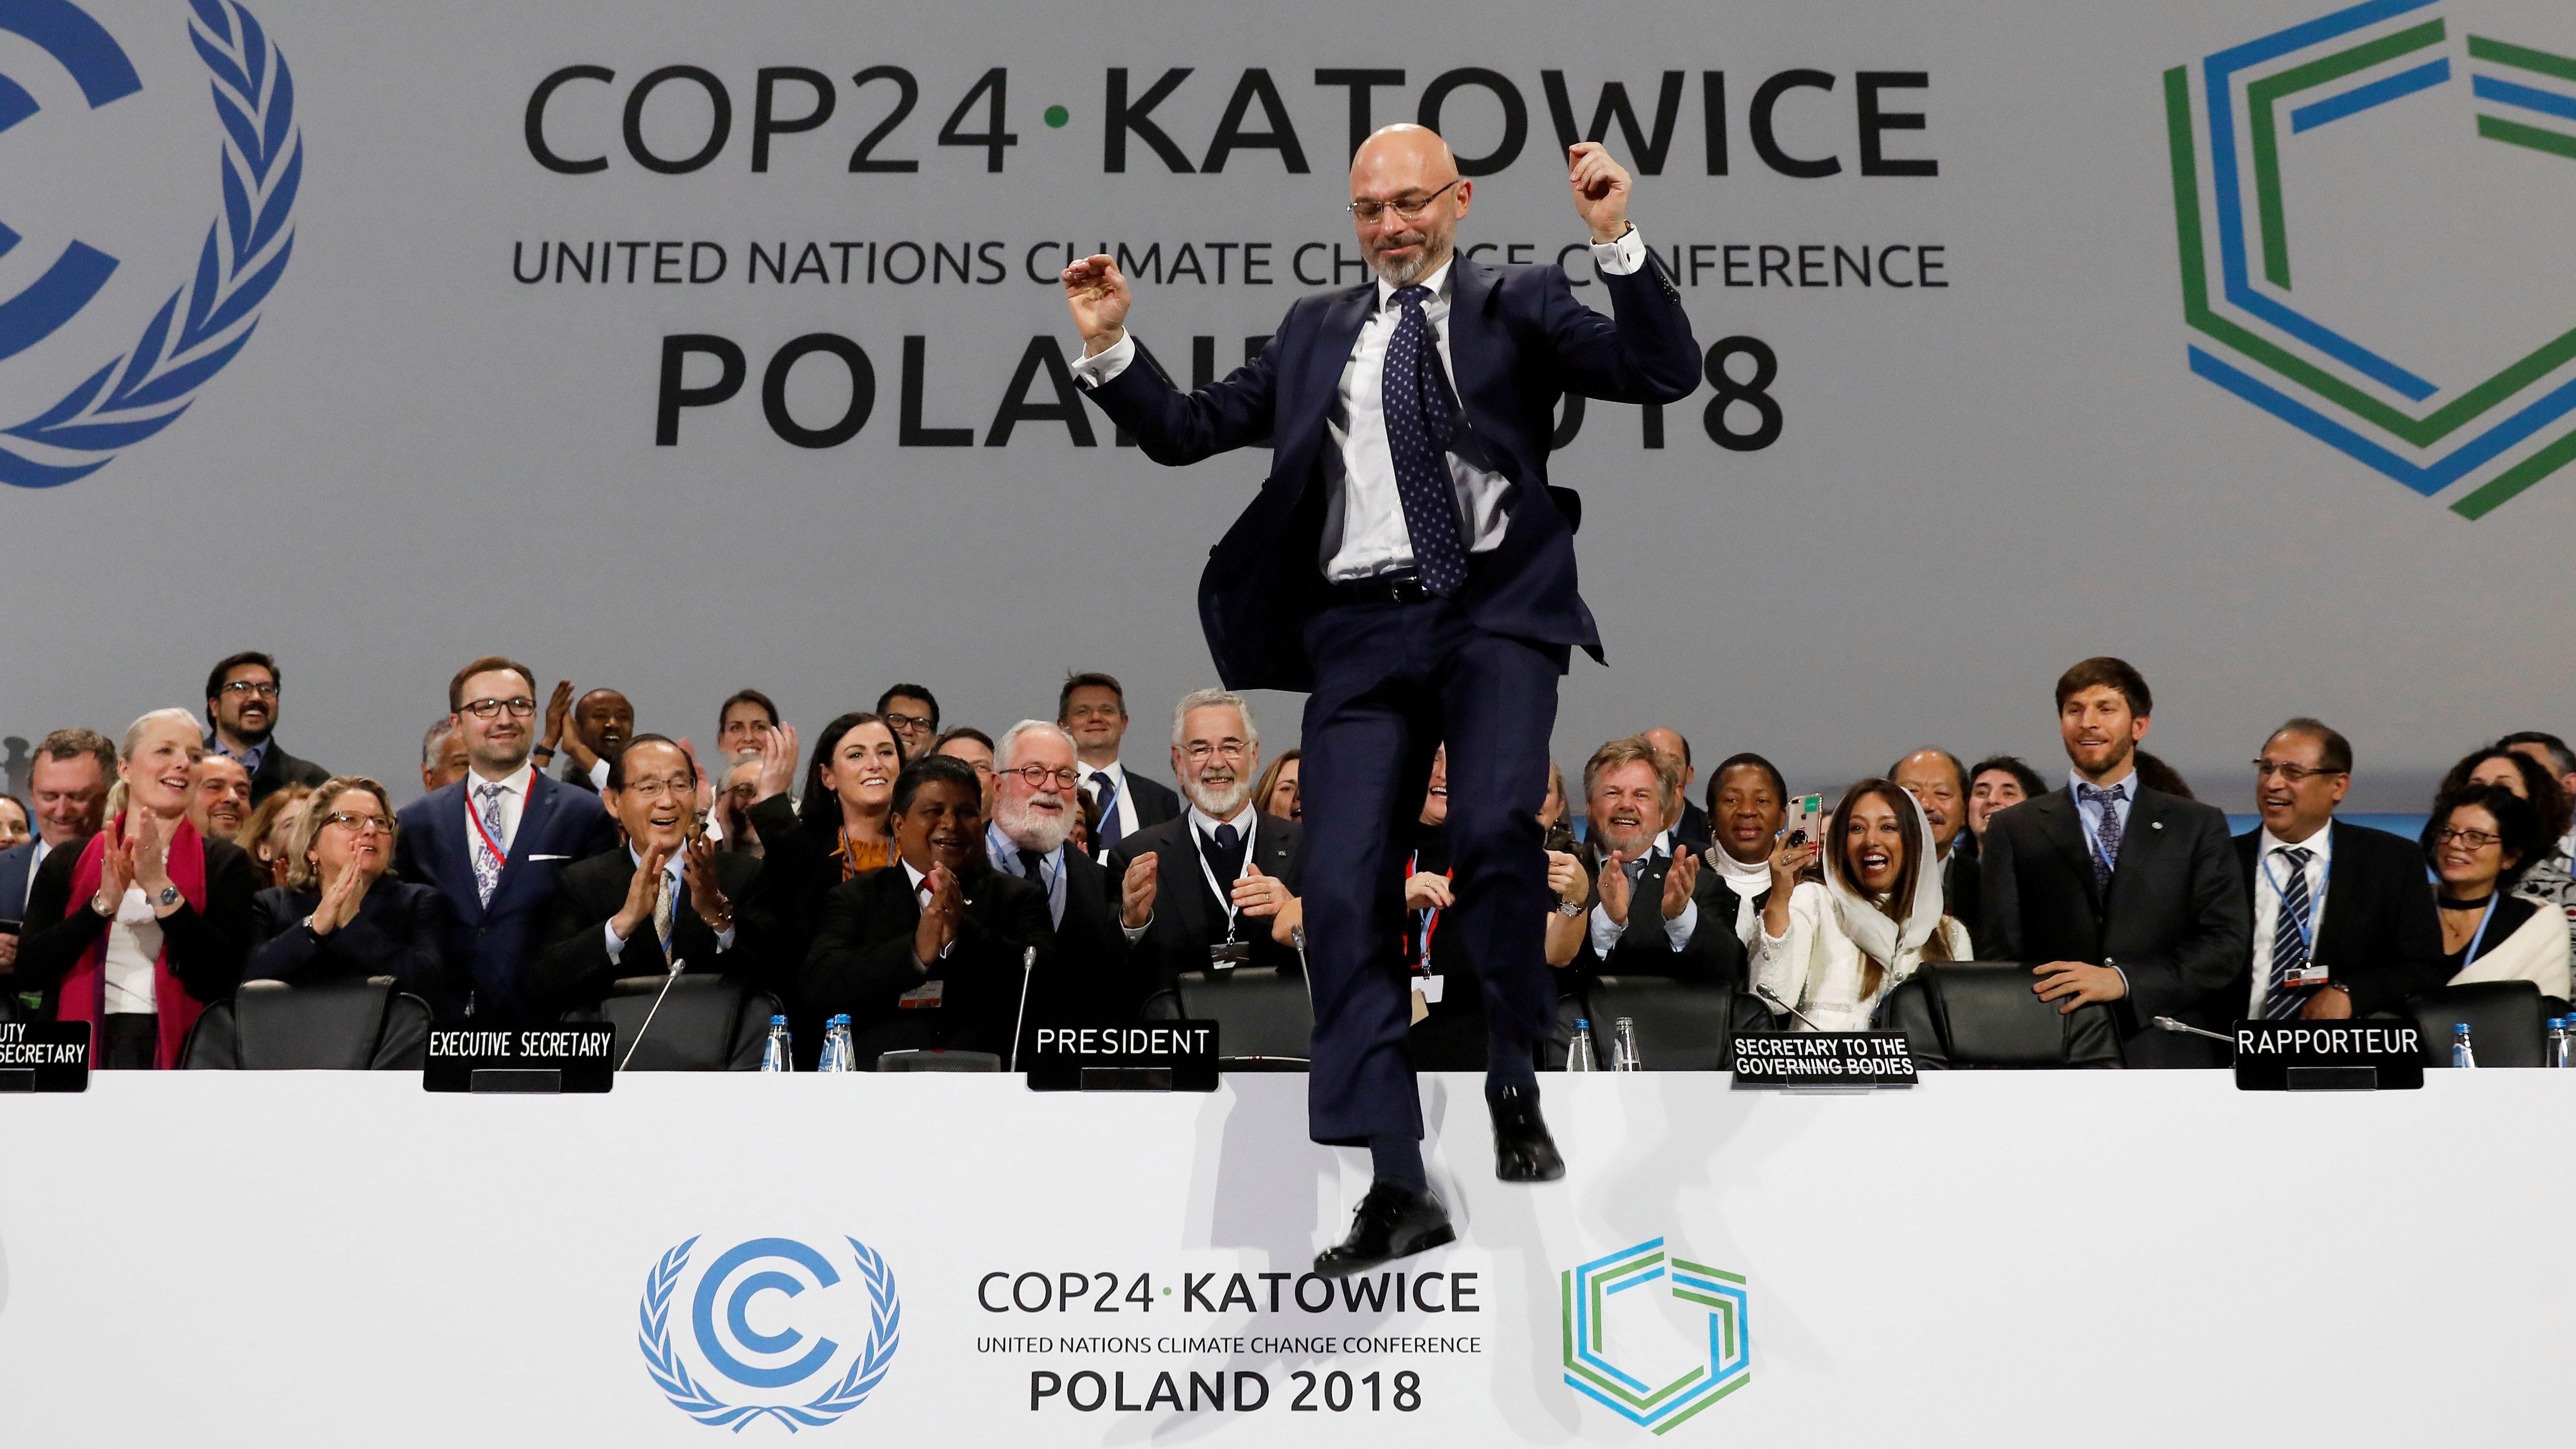 katowice-india-climate-change-equity-finance